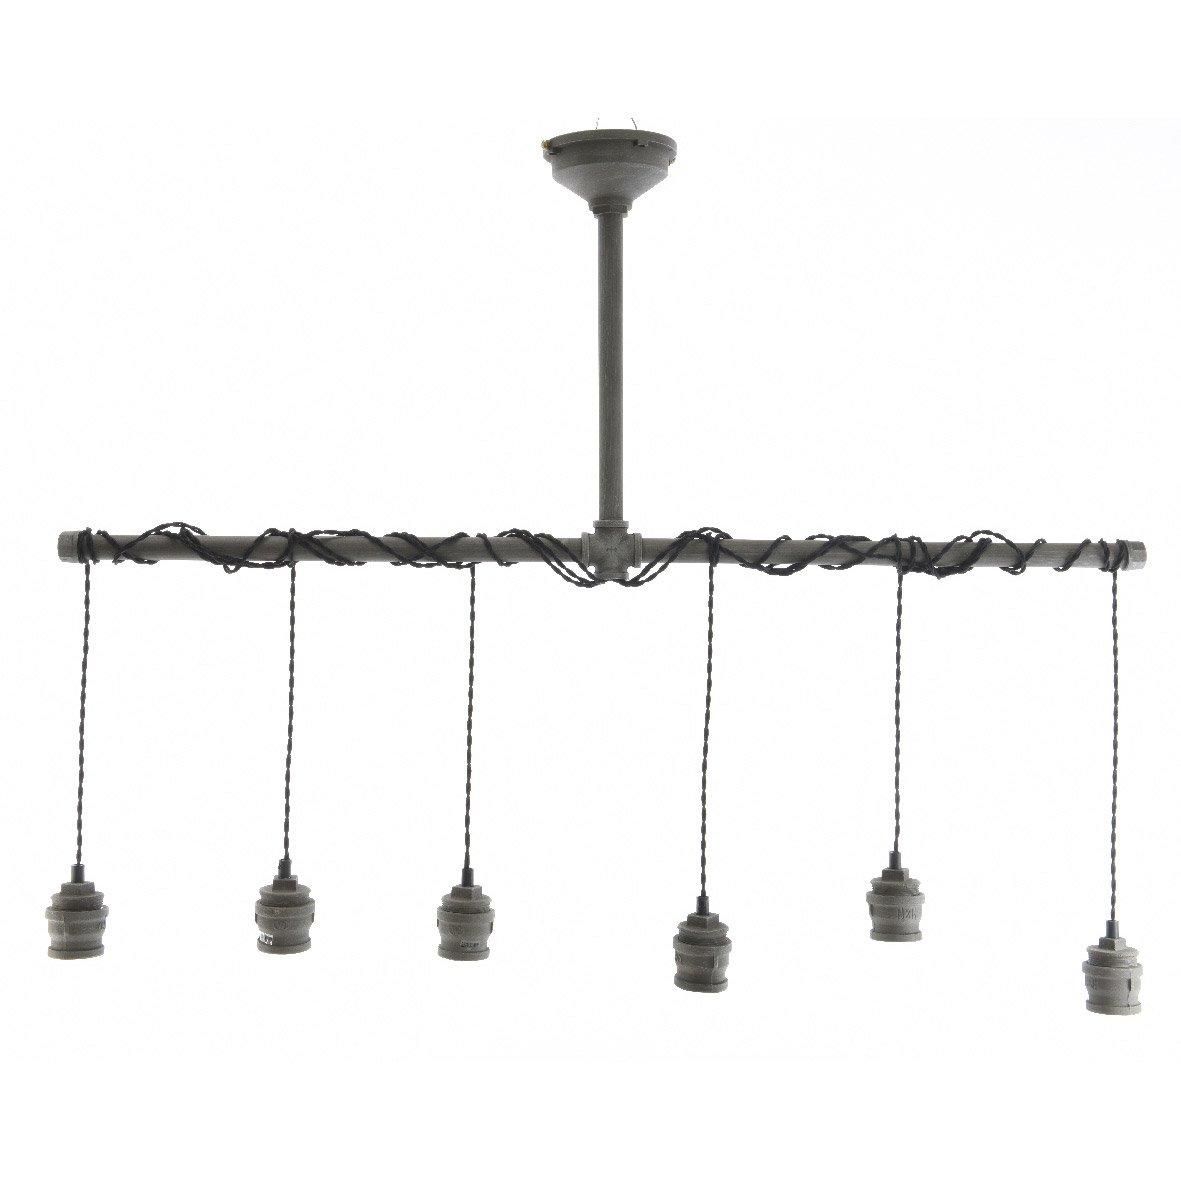 suspension e27 style industriel tuyau m tal noir 6 x 40 w leroy merlin. Black Bedroom Furniture Sets. Home Design Ideas